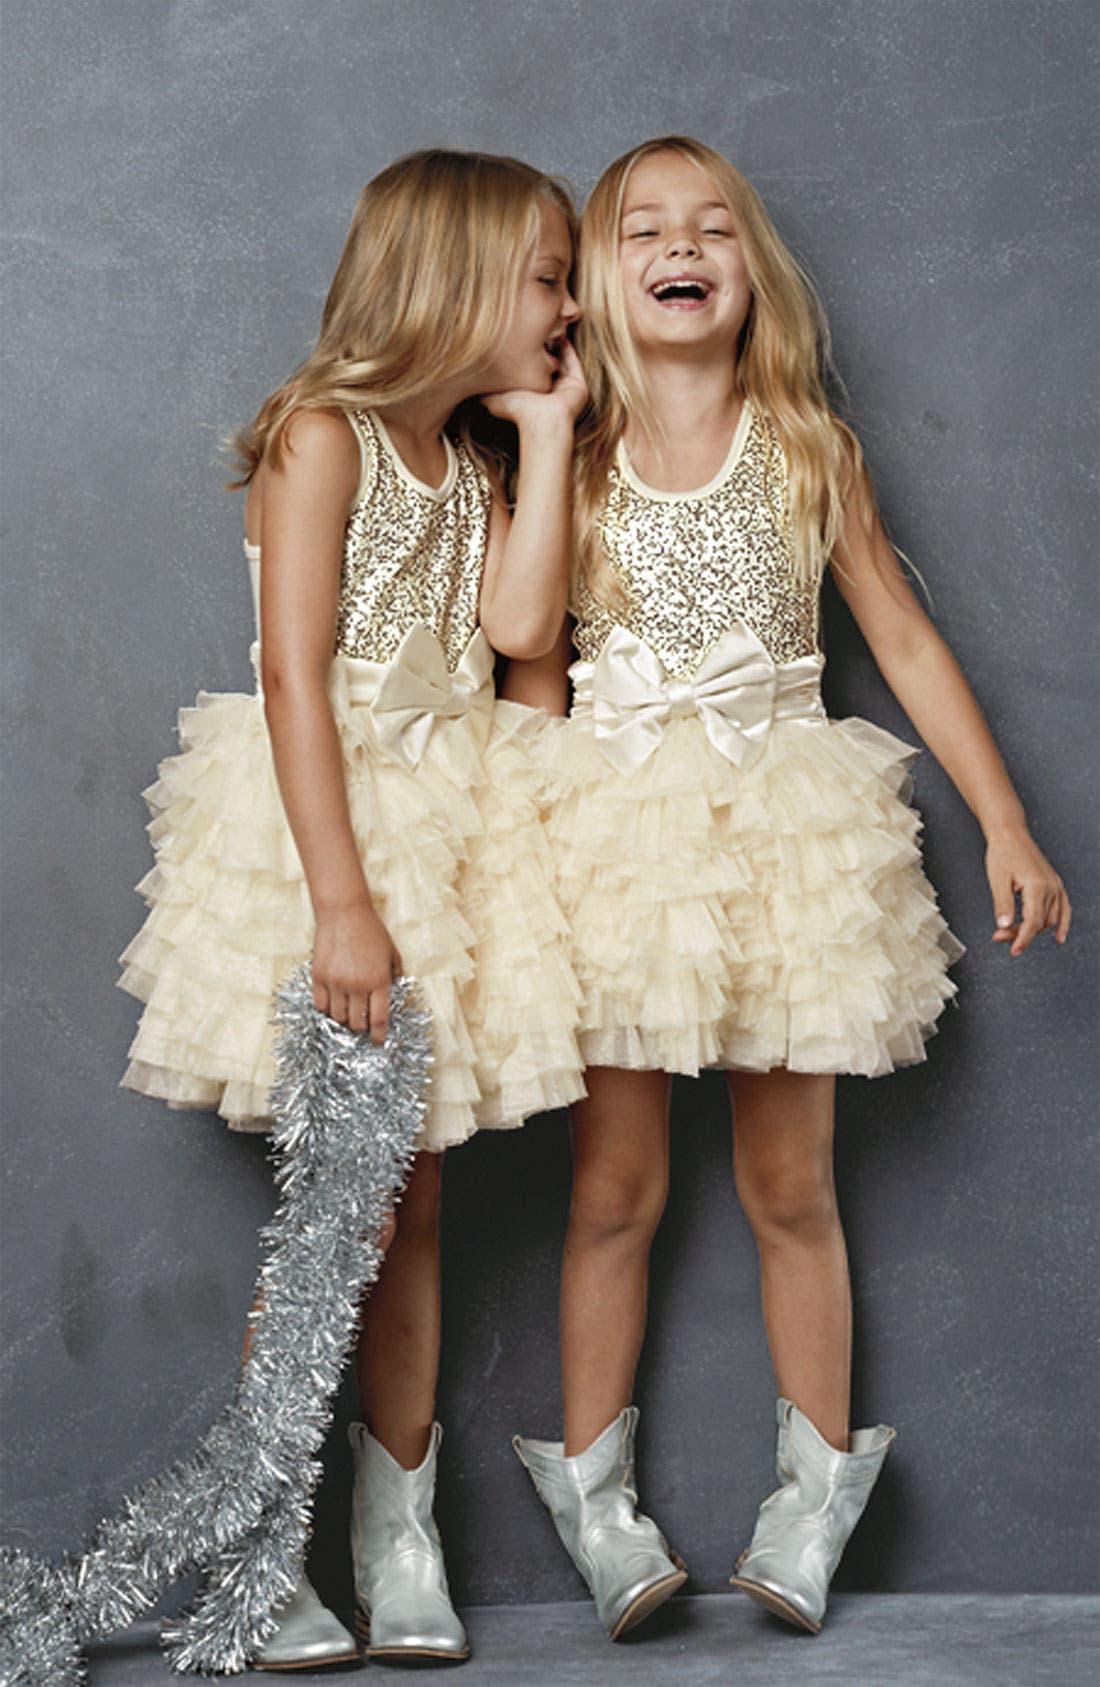 Main Image - Ooh! La, La! Couture Dress & Peek Boots (Little Girls & Big Girls)